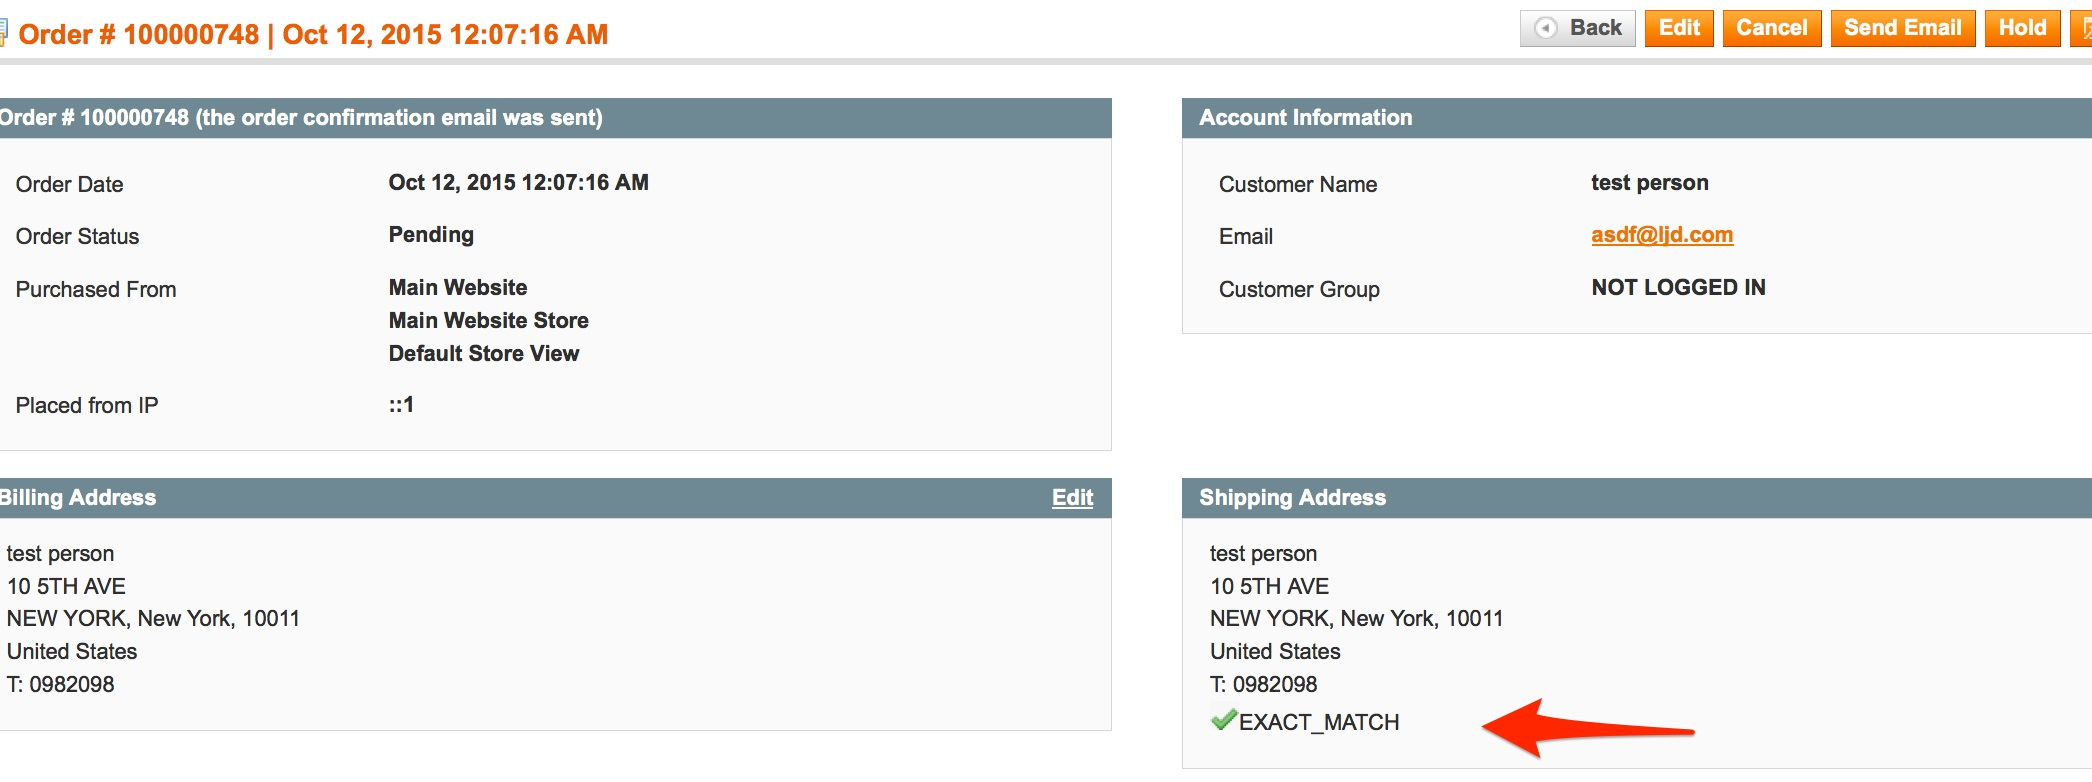 Address Validation - ShipperHQ Docs